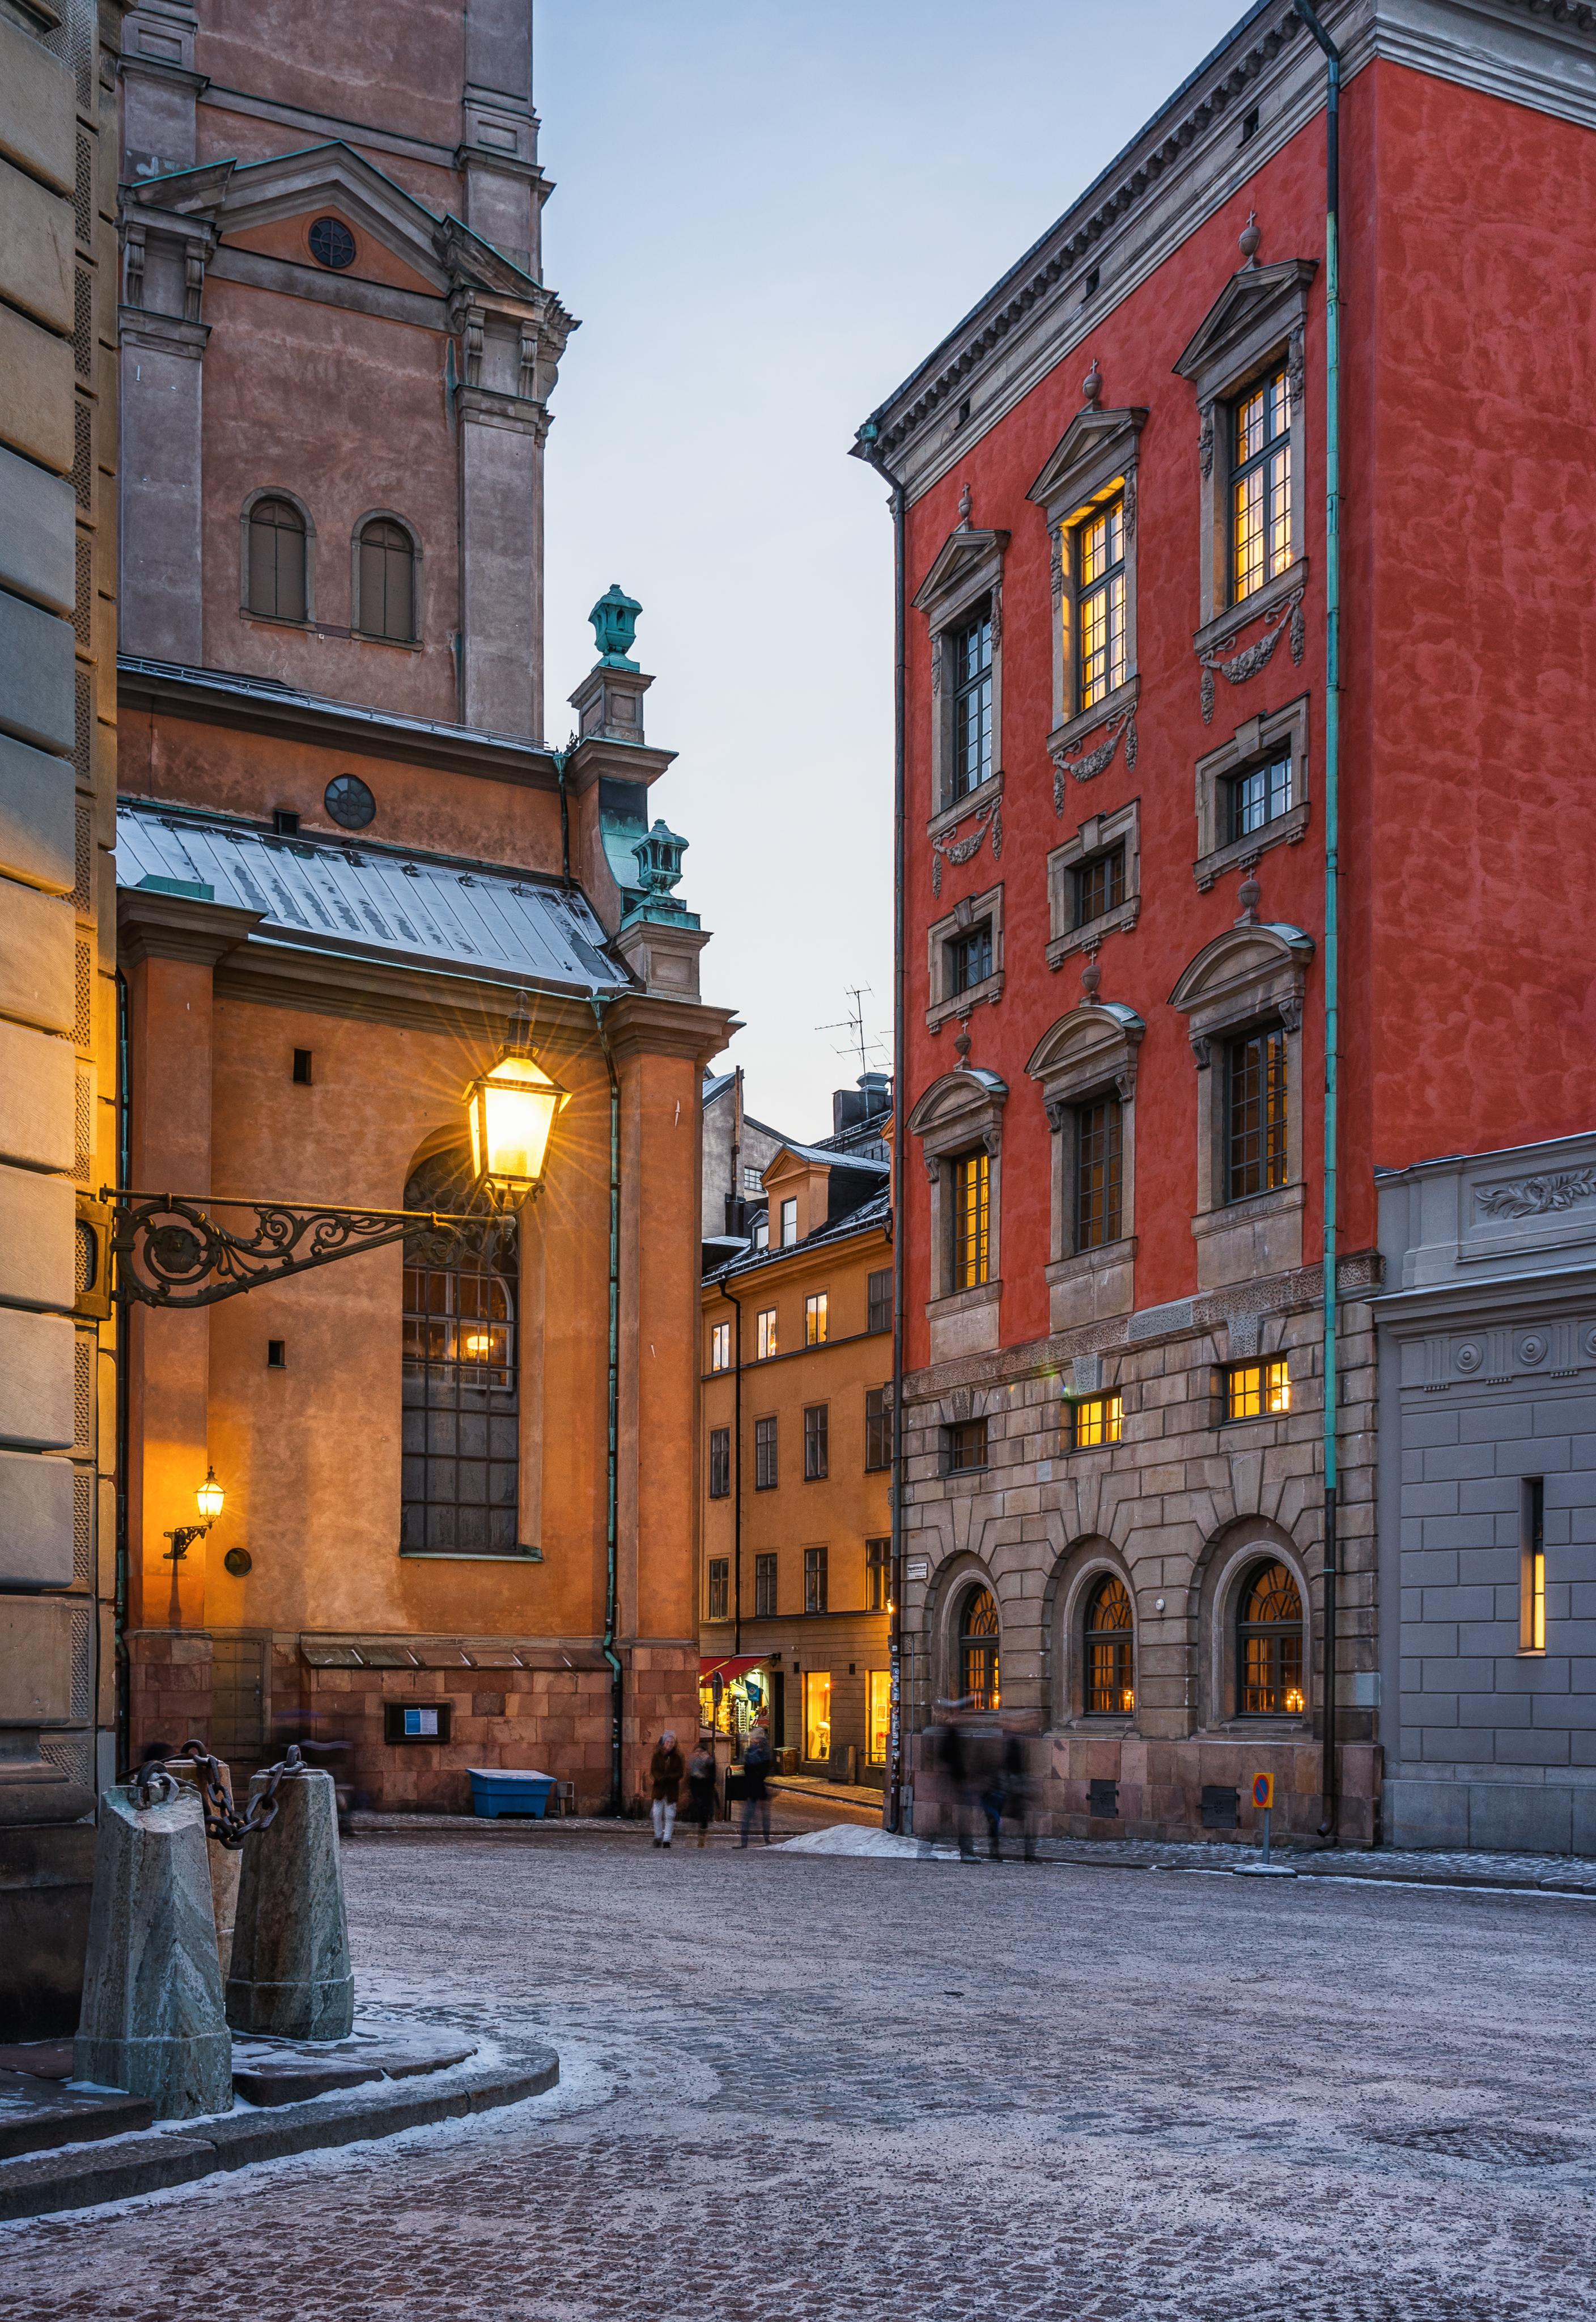 Axel_Oxenstiernas_palatset_Kvarteret_Neptunus_Stockholm_2016_01.jpg